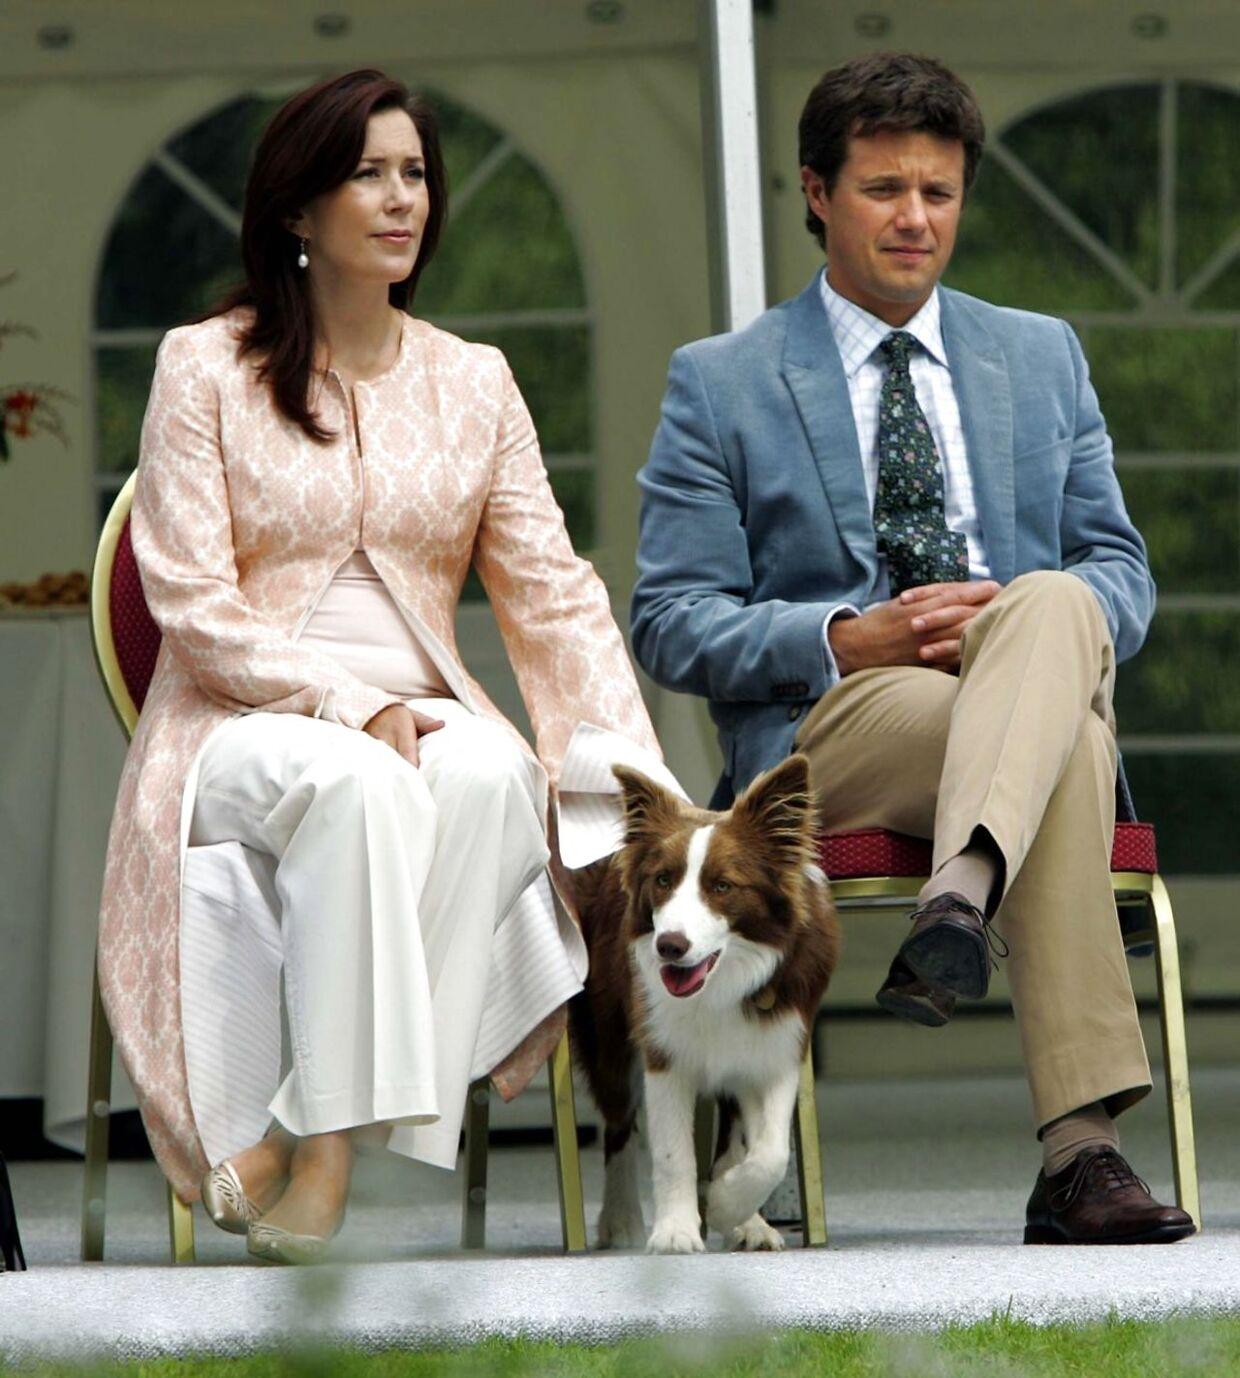 Den danske kongelige famlie er samlet på Gråsten Slot. Her er det kronprinsesse Mary og kronprins Frederik med deres hund Ziggy.